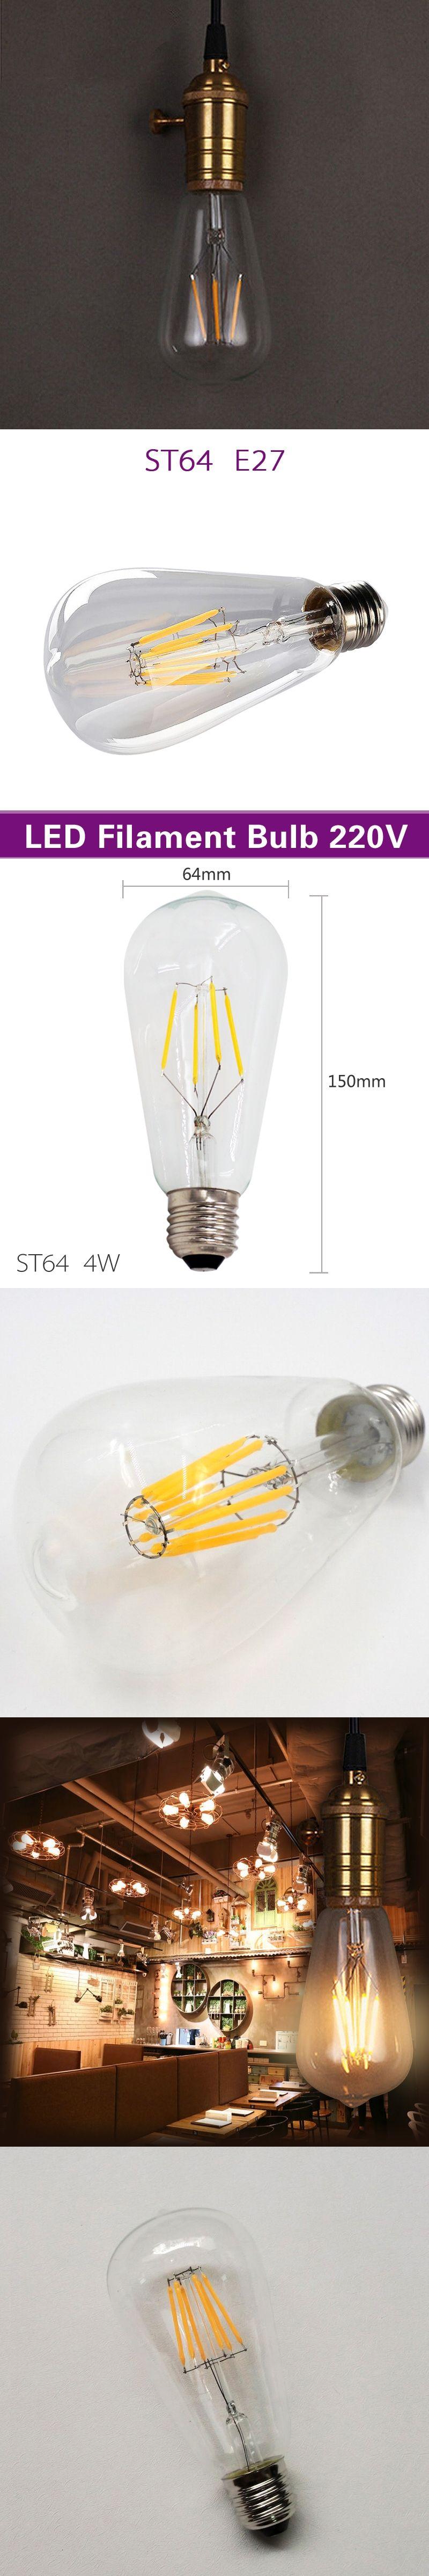 Mingben Retro Led Filament Light Bulb Dimmable St64 E27 220v 4w 8w 12v Fluorescent Lamp Driver Smart Ic